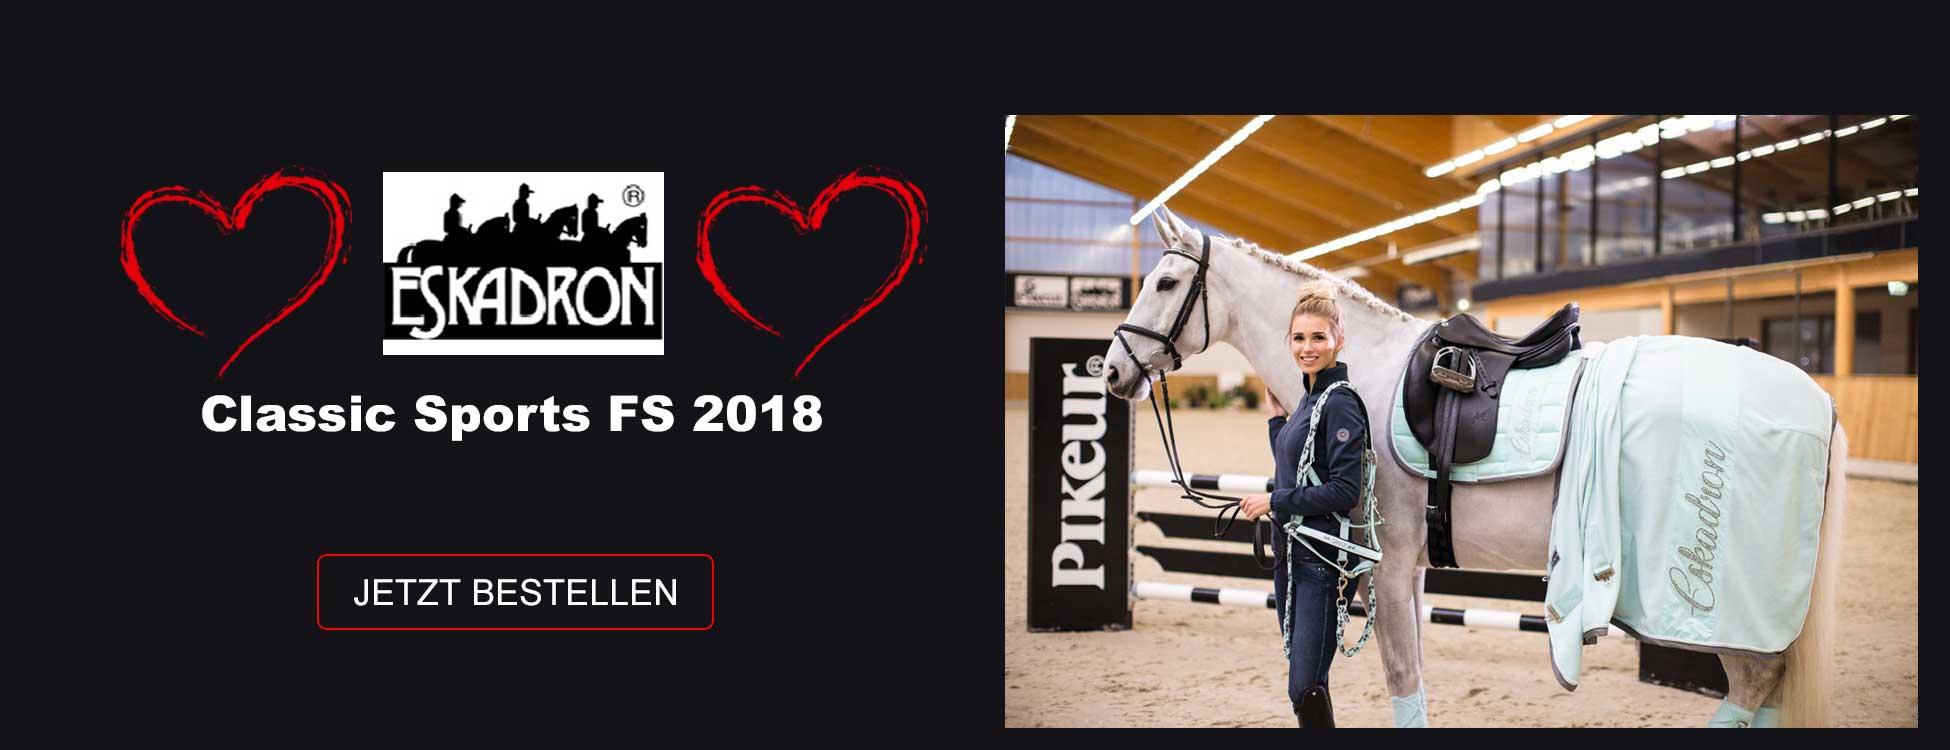 Eskadron Classic Sports FS 2018